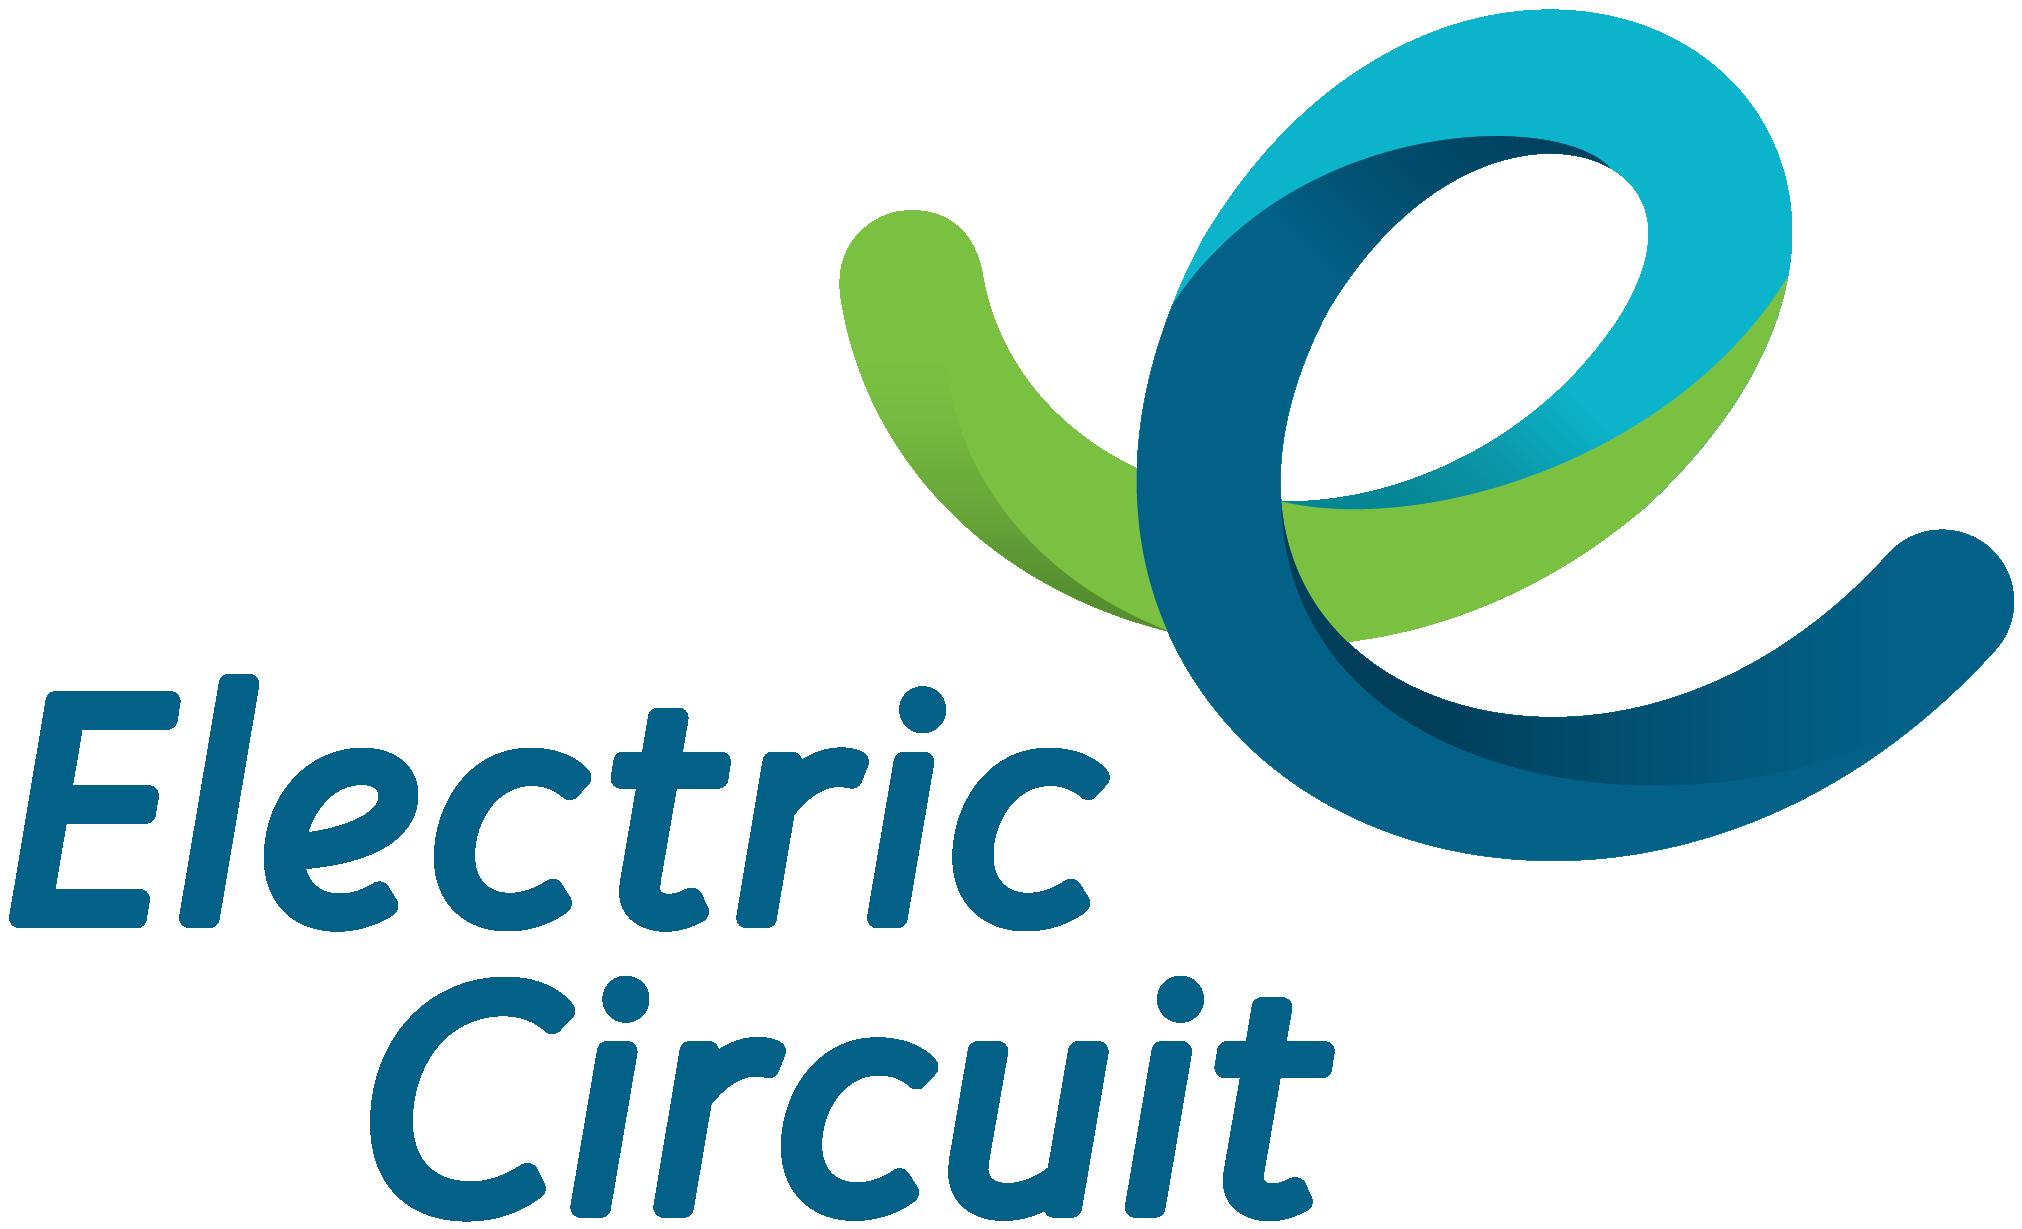 Electric Circuit